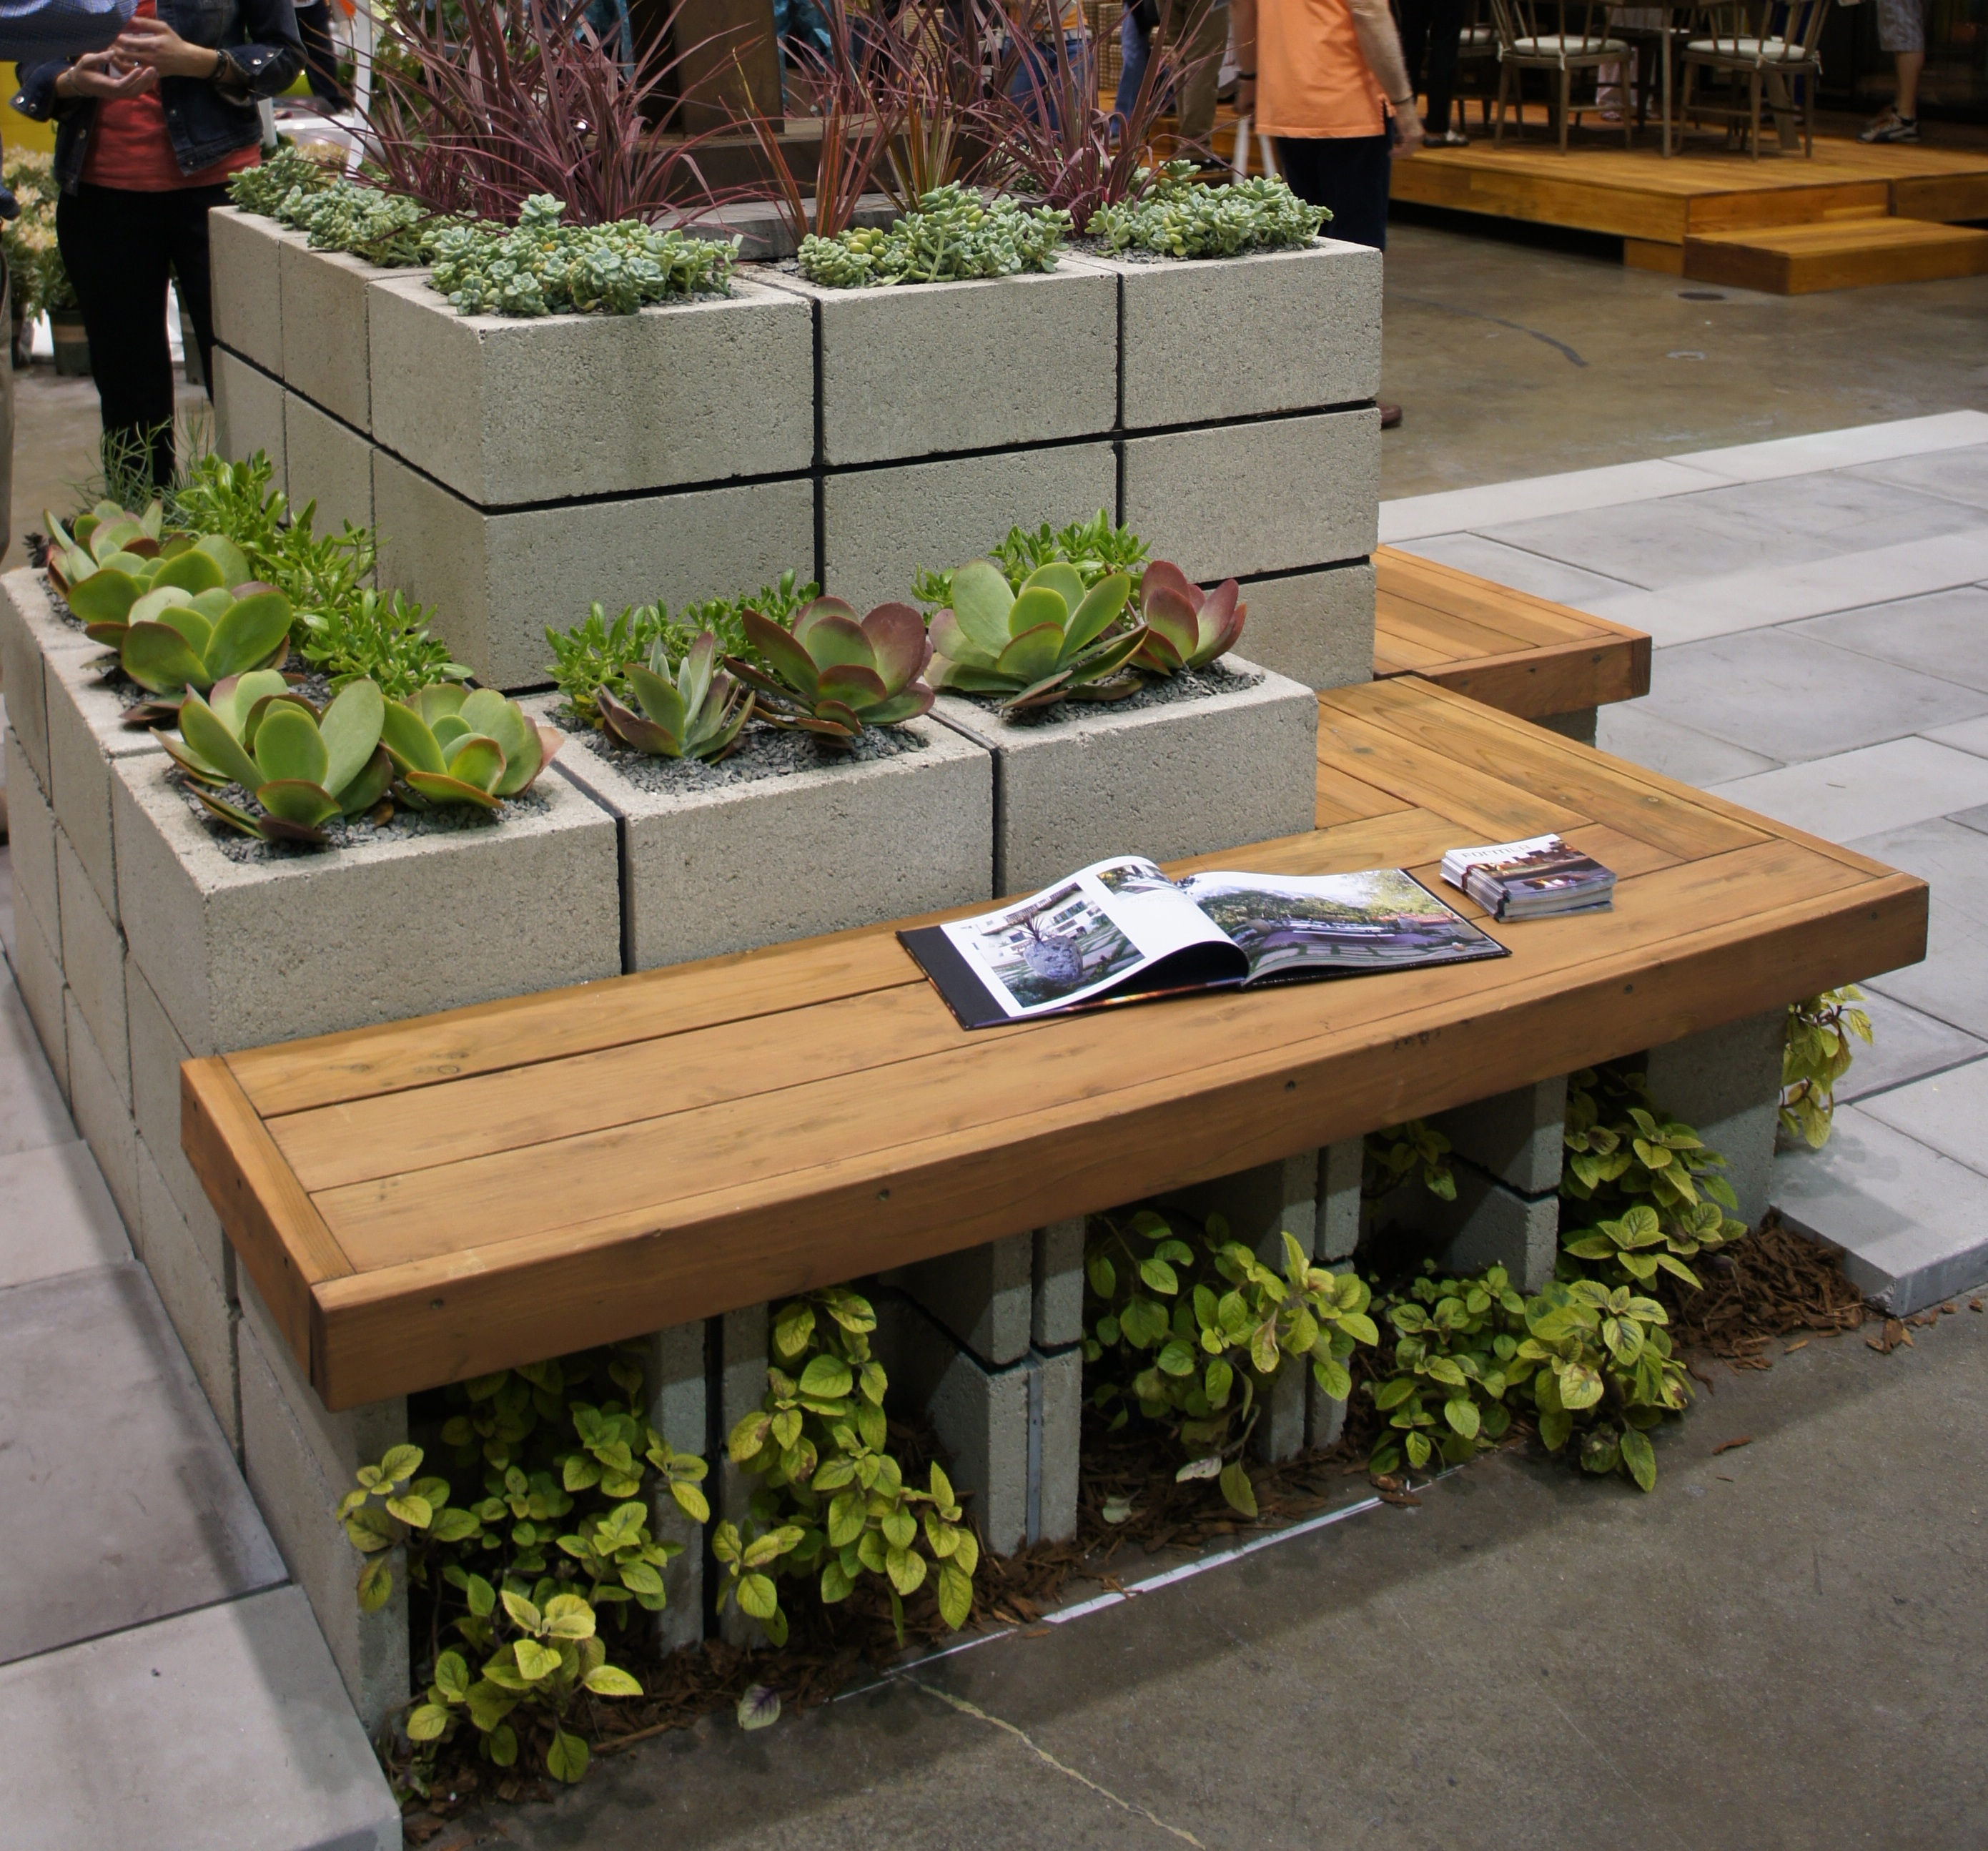 Creative Design For Raised Garden Bed Ideas Ideas Vegetable